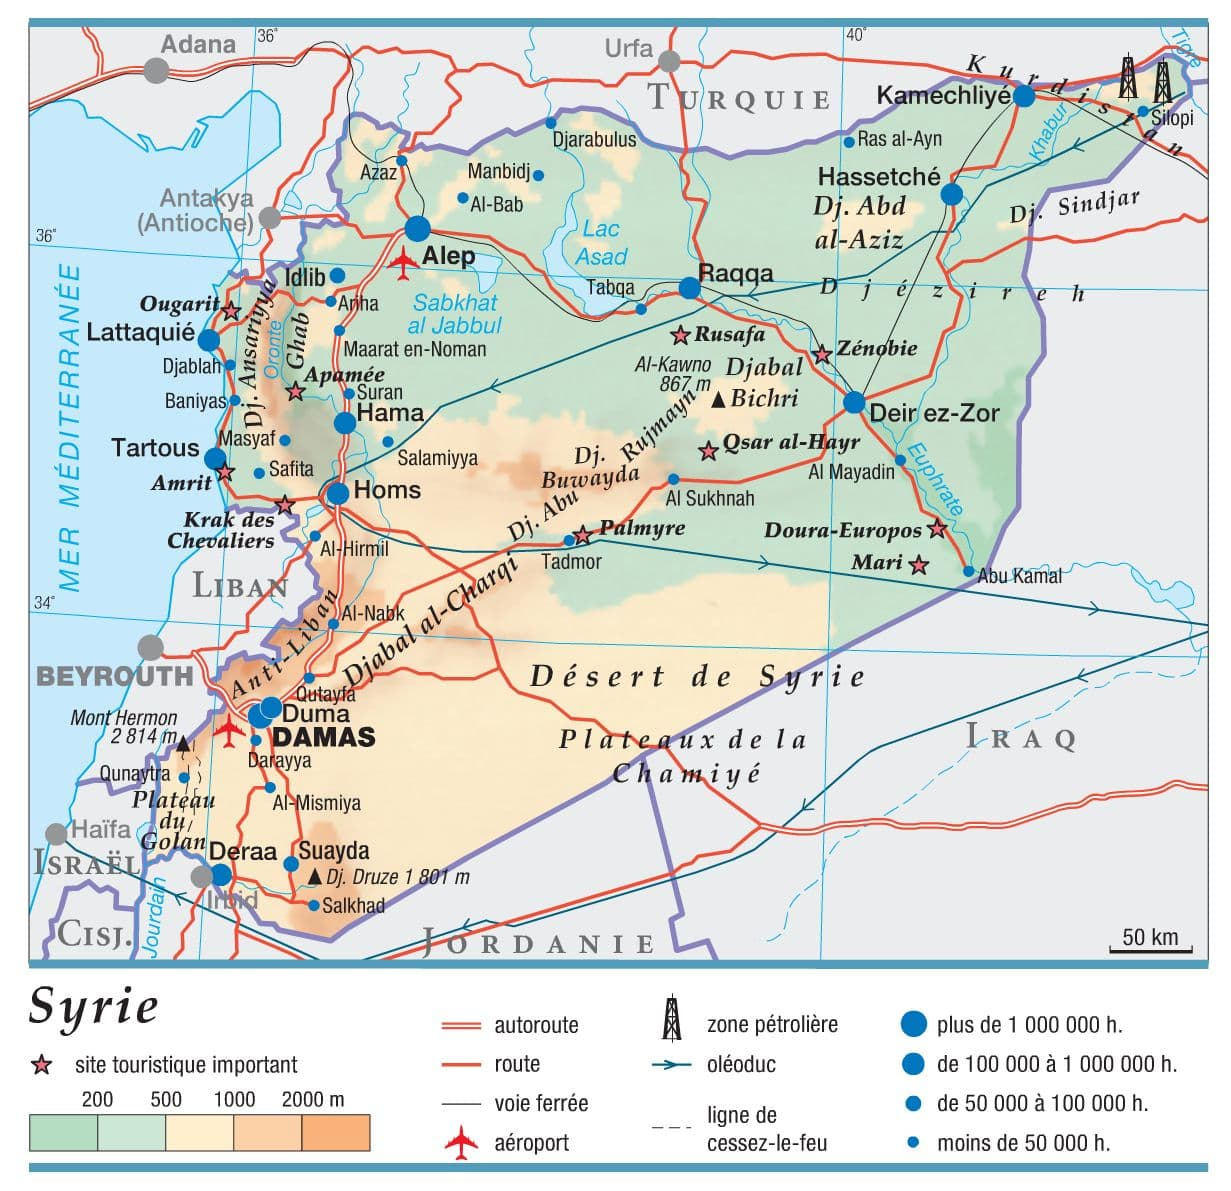 https://i1.wp.com/www.larousse.fr/encyclopedie/data/cartes/1306143-Syrie.HD.jpg